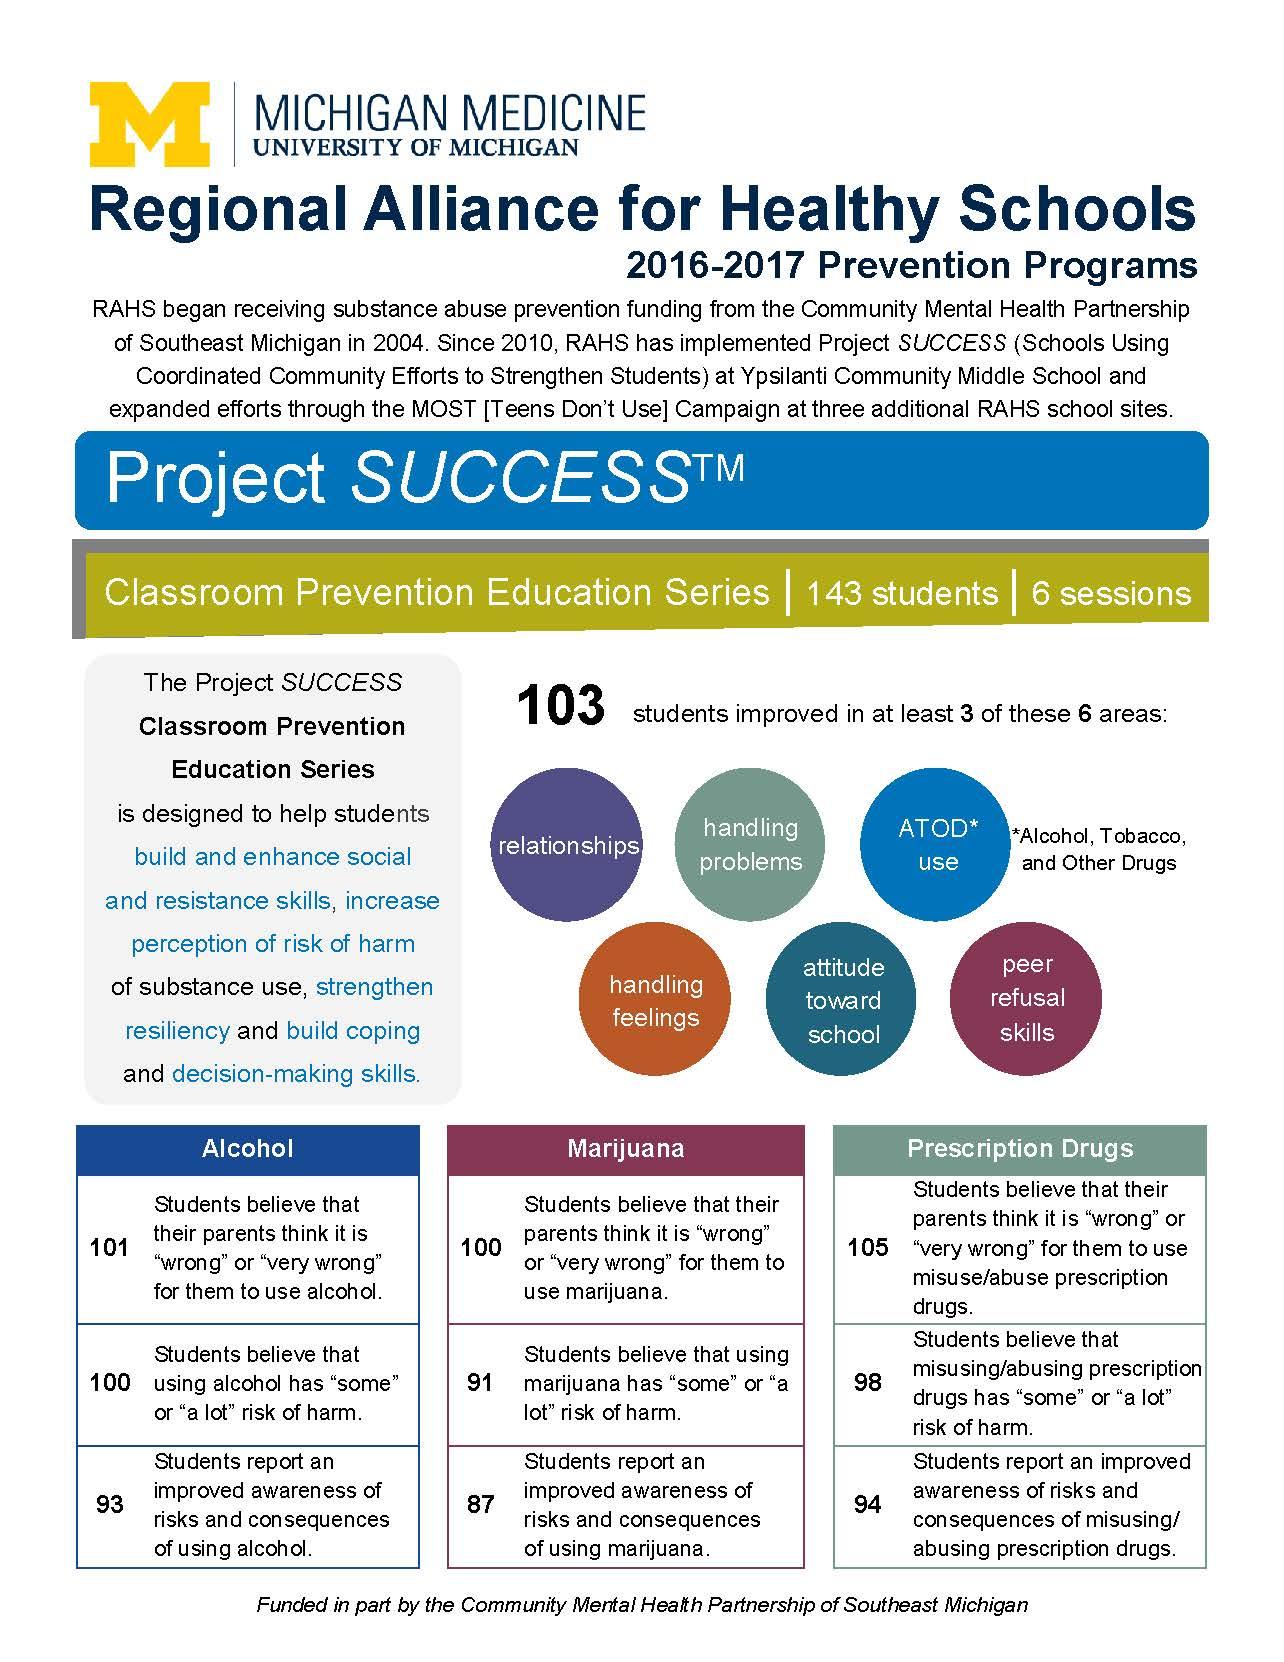 Project Success FY17 Program Brief page 1